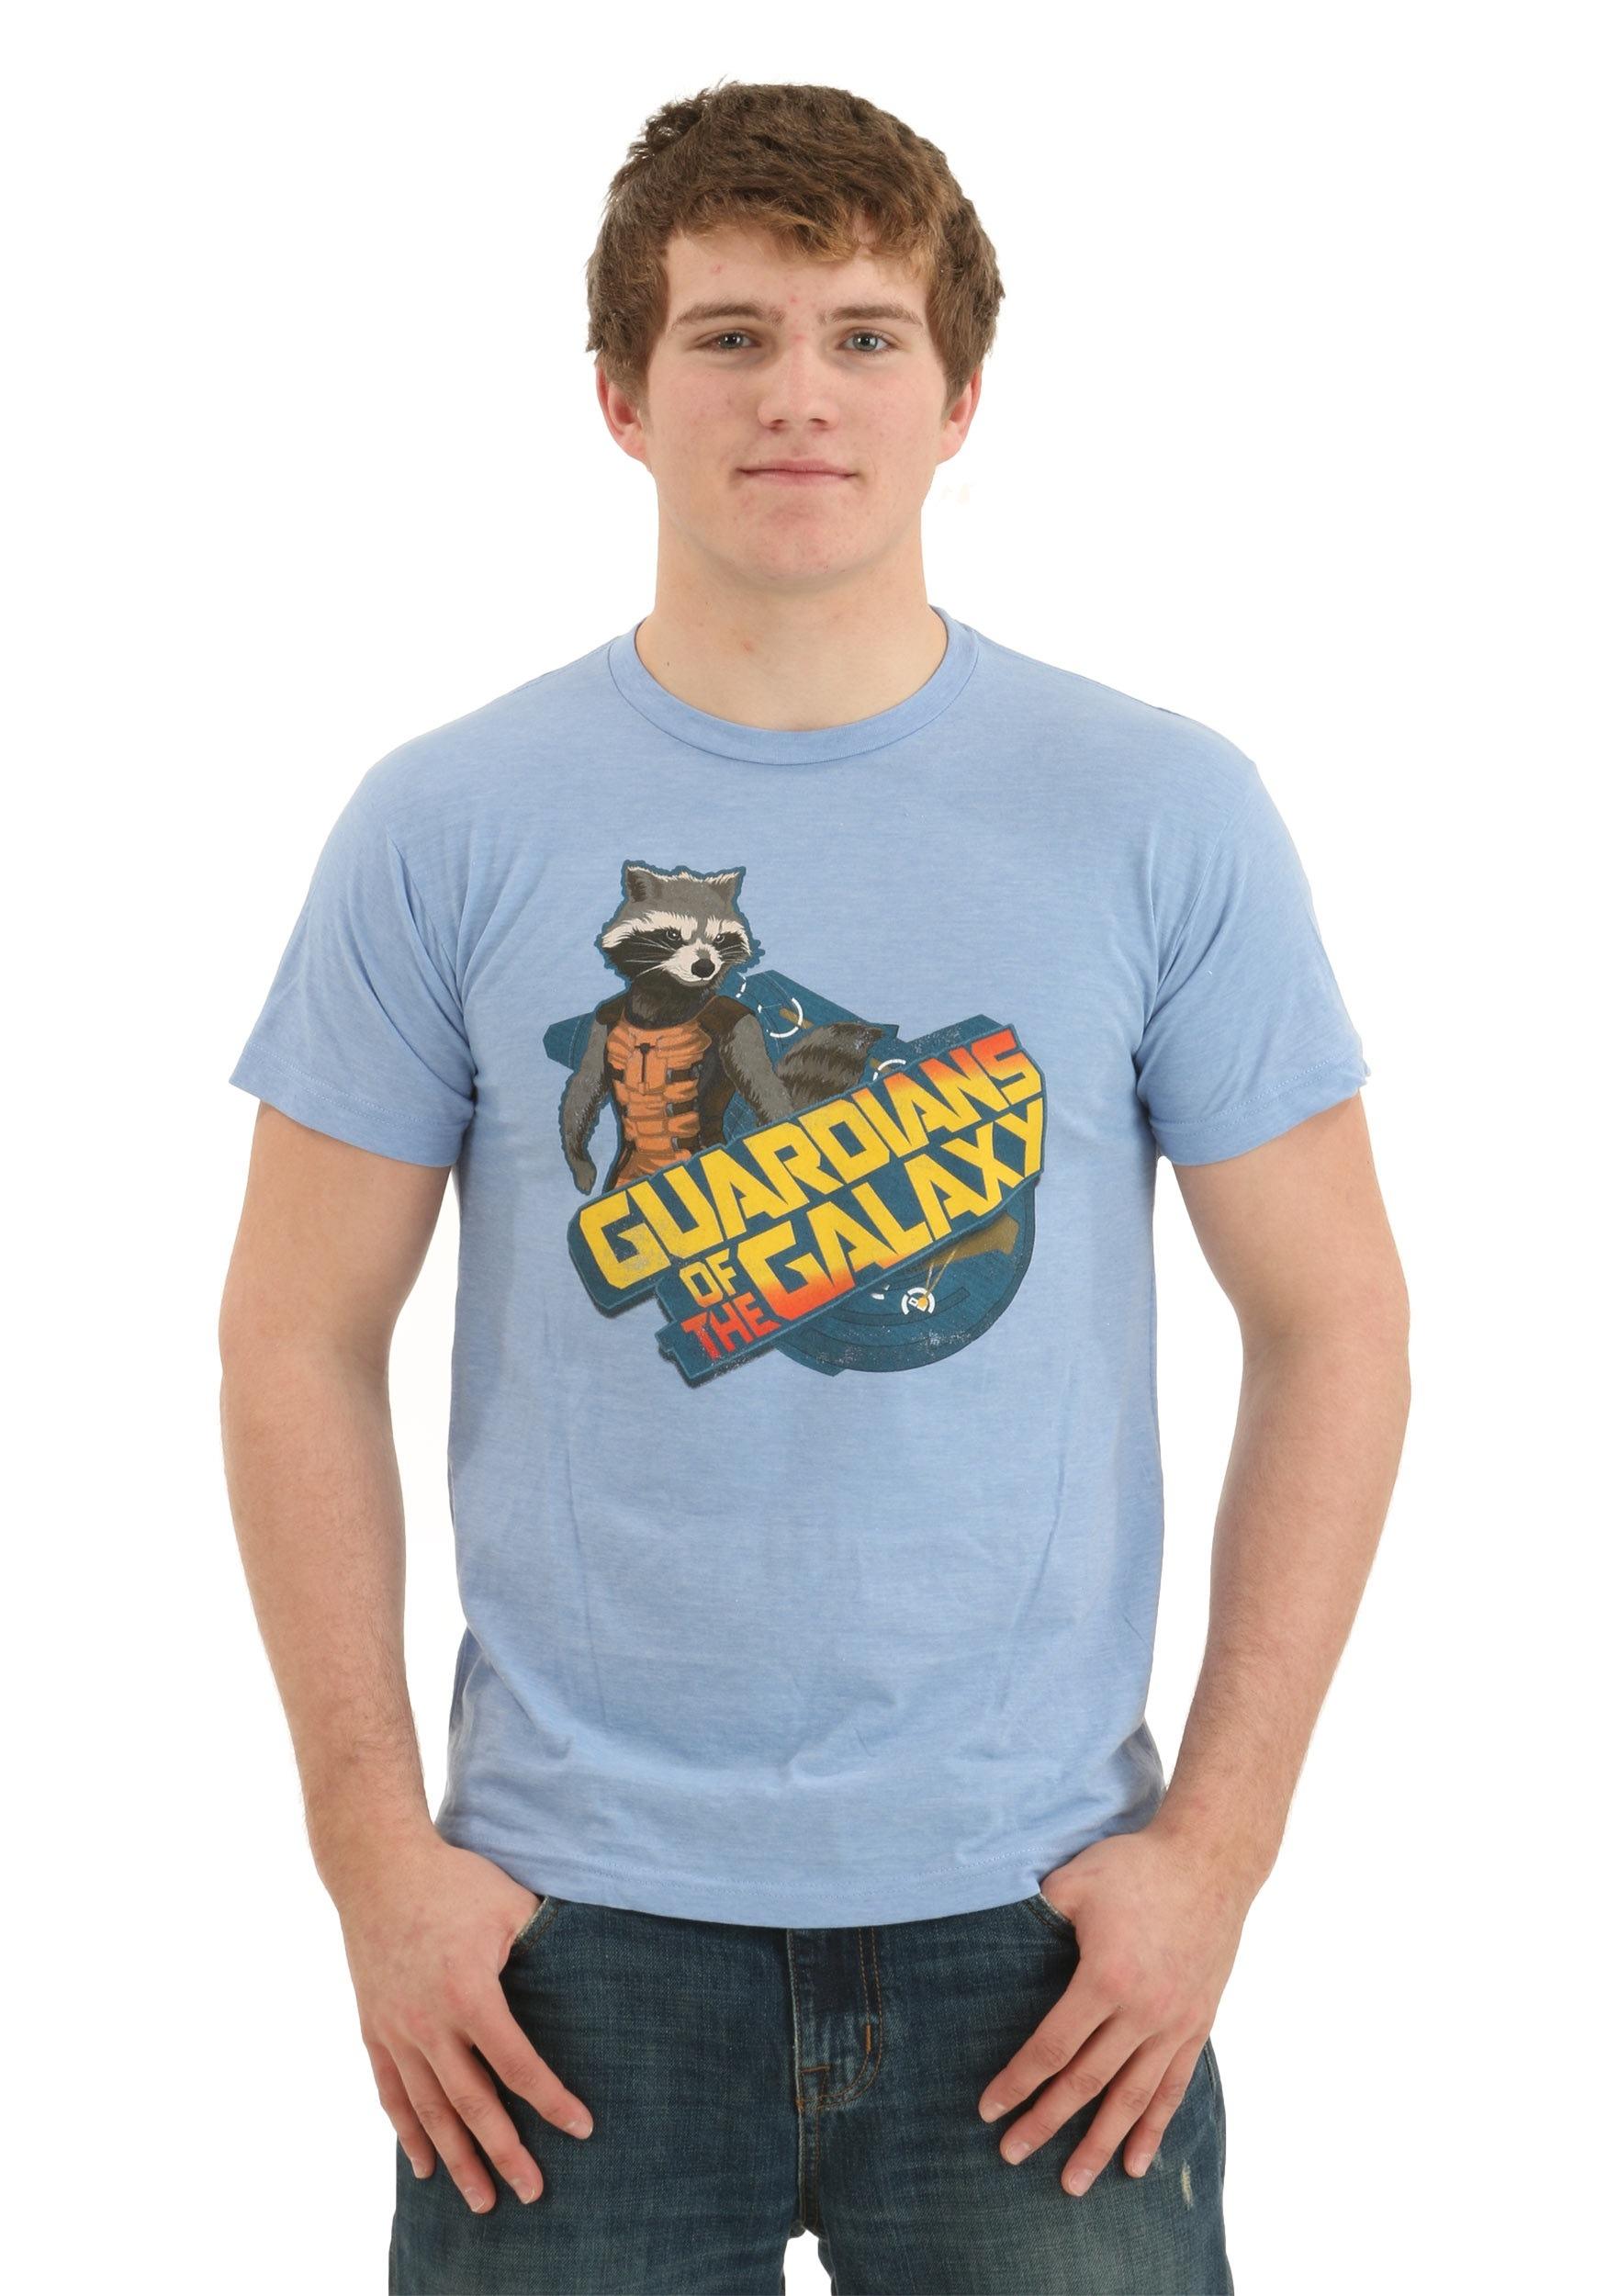 Guardians of the Galaxy Rocket Raccoon Blue T-Shirt IM452101